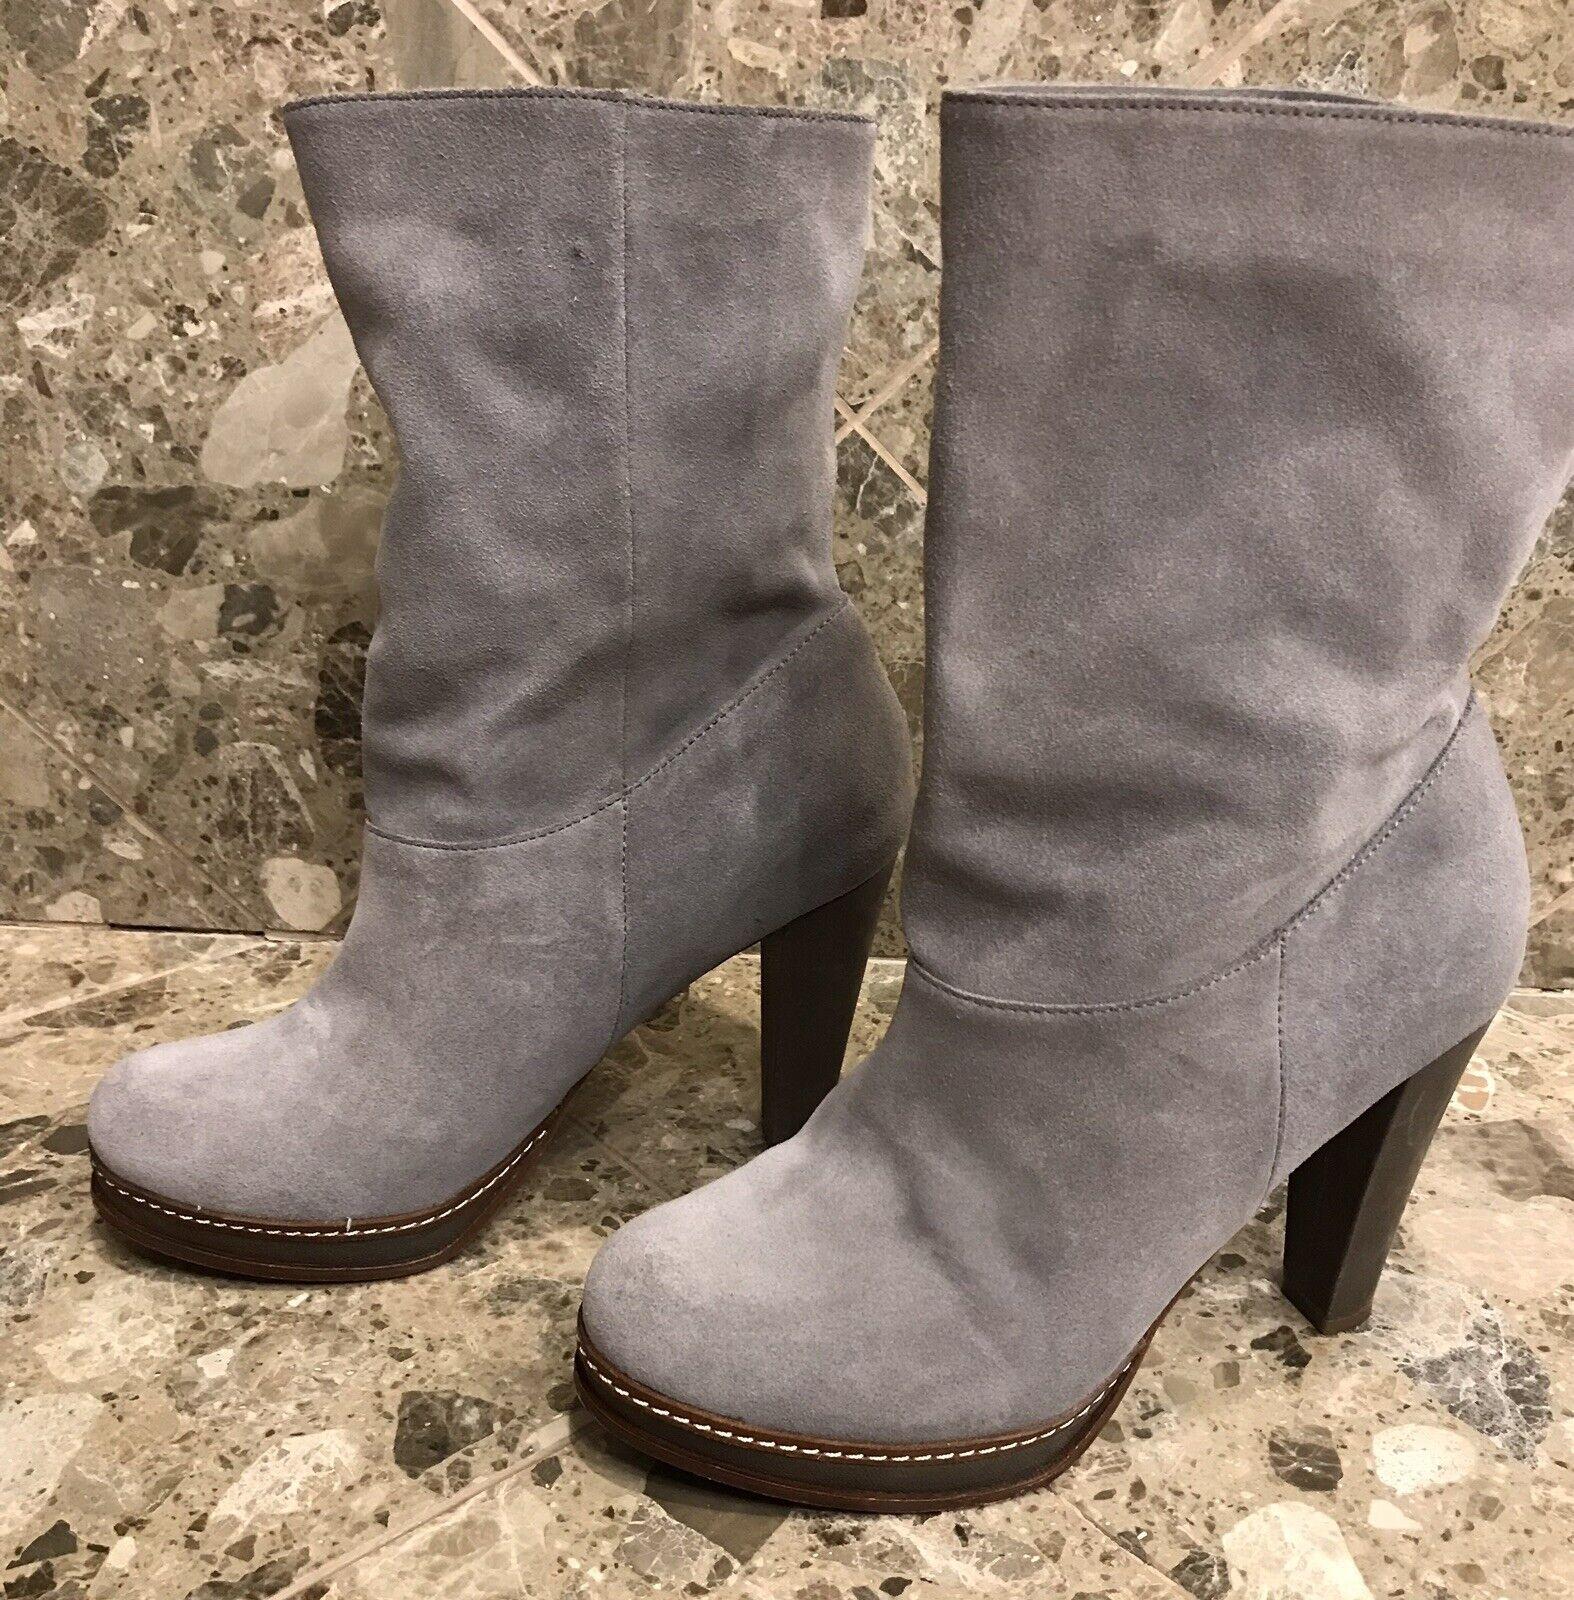 Cole Haan Para Mujer botas De Plataforma gris Gamuza Ironstone Slouch US 9.5B